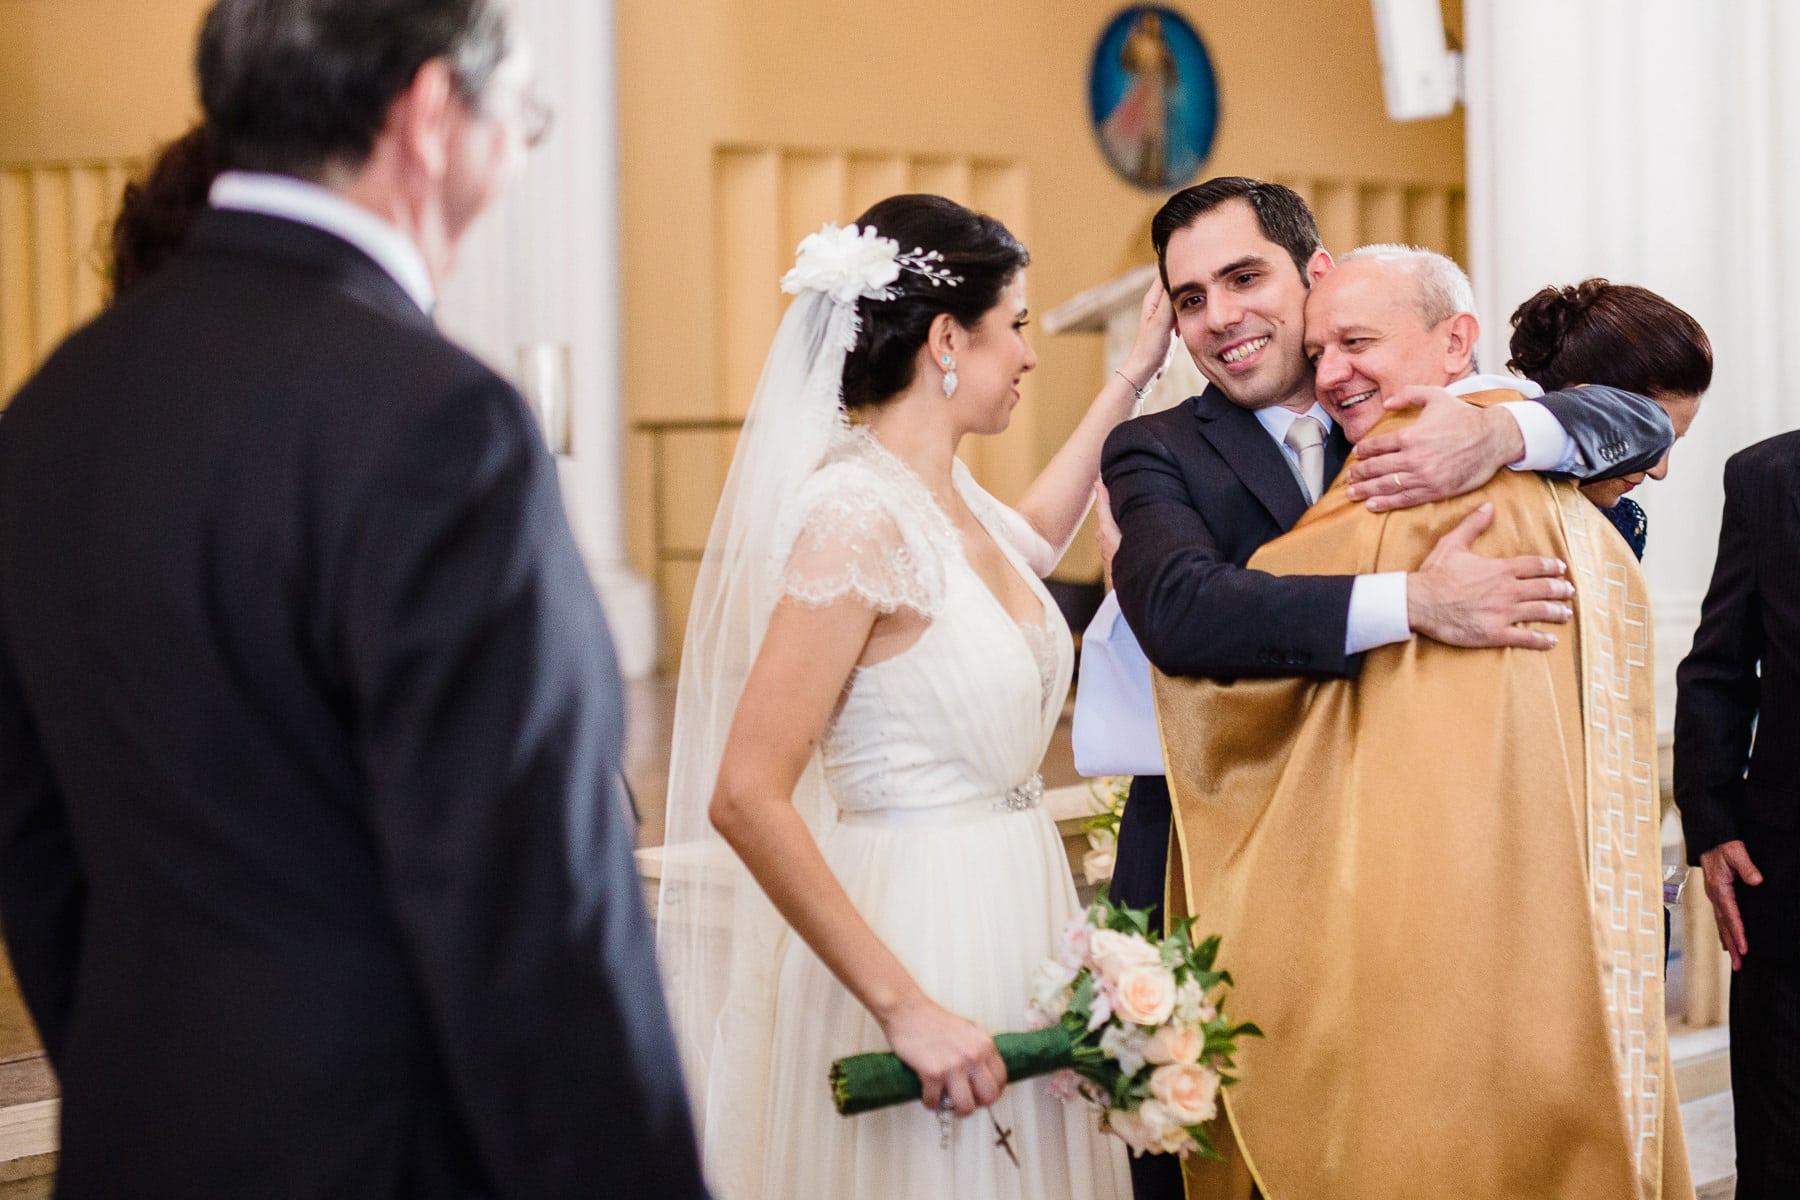 casamento-igreja-do-cristo-rei-fortaleza-55